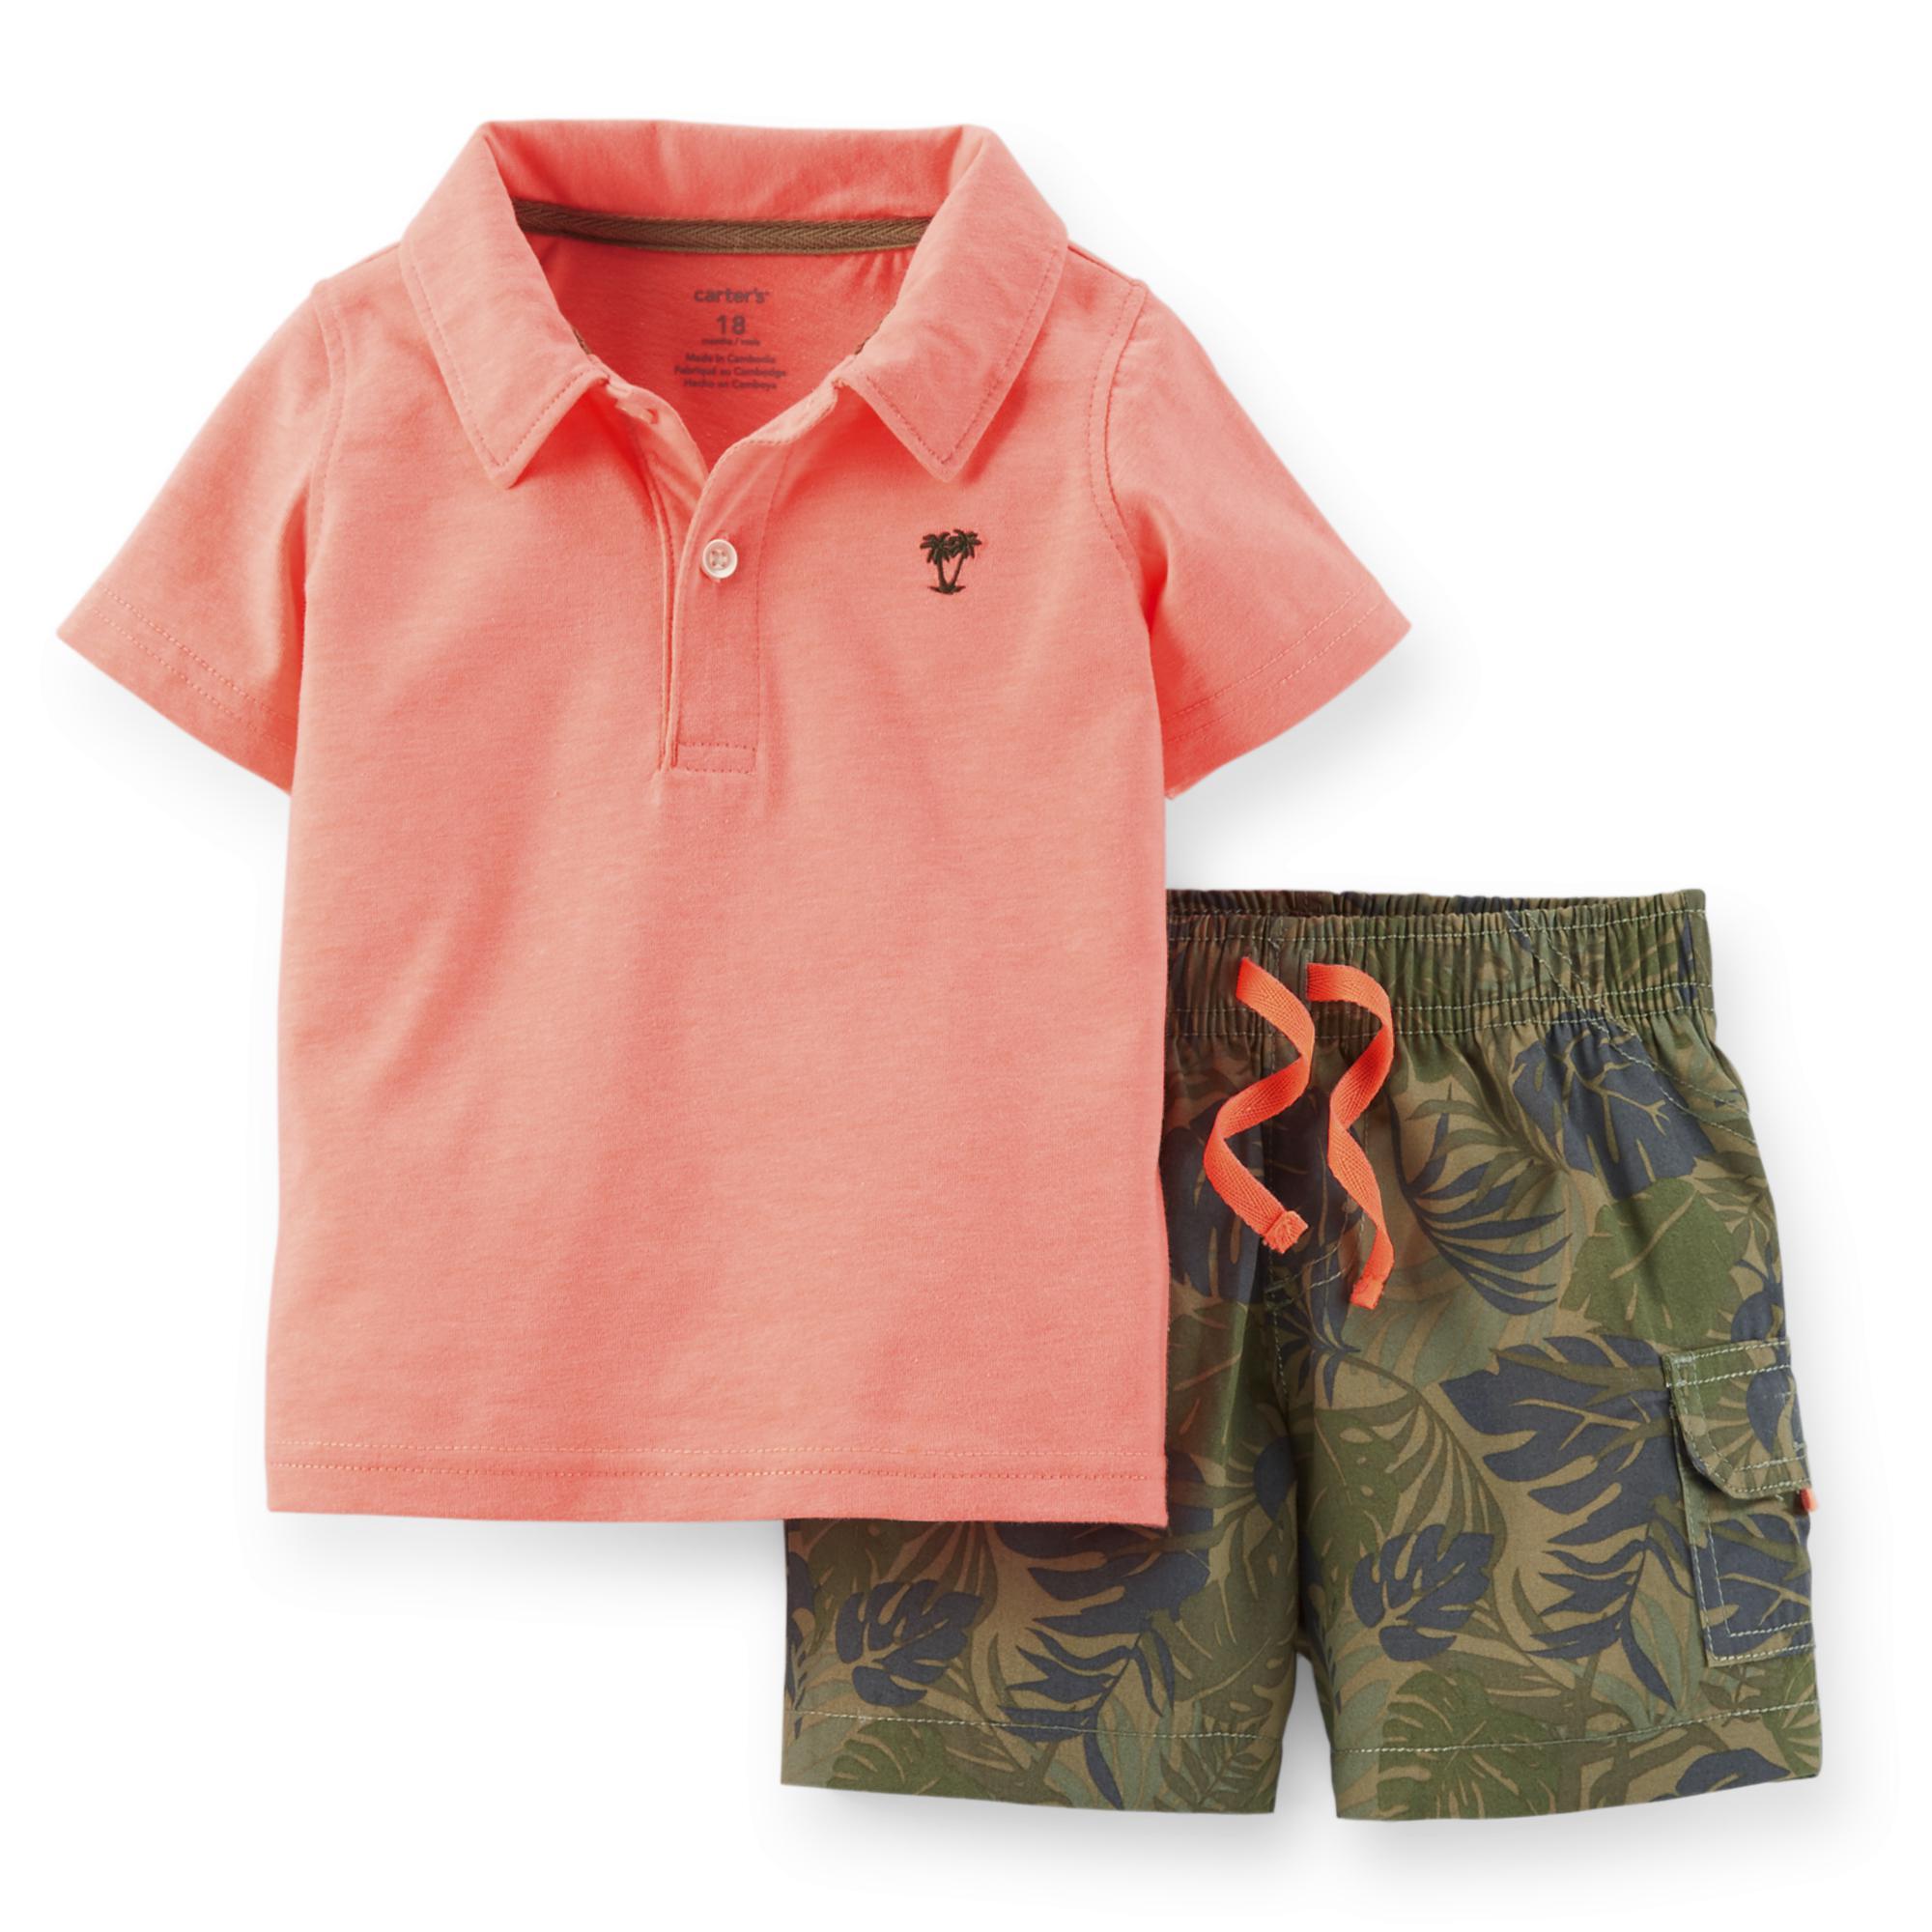 Carter's Newborn Infant & Toddler Boy's Polo Shirt & Cargo Shorts - Leaf Camo